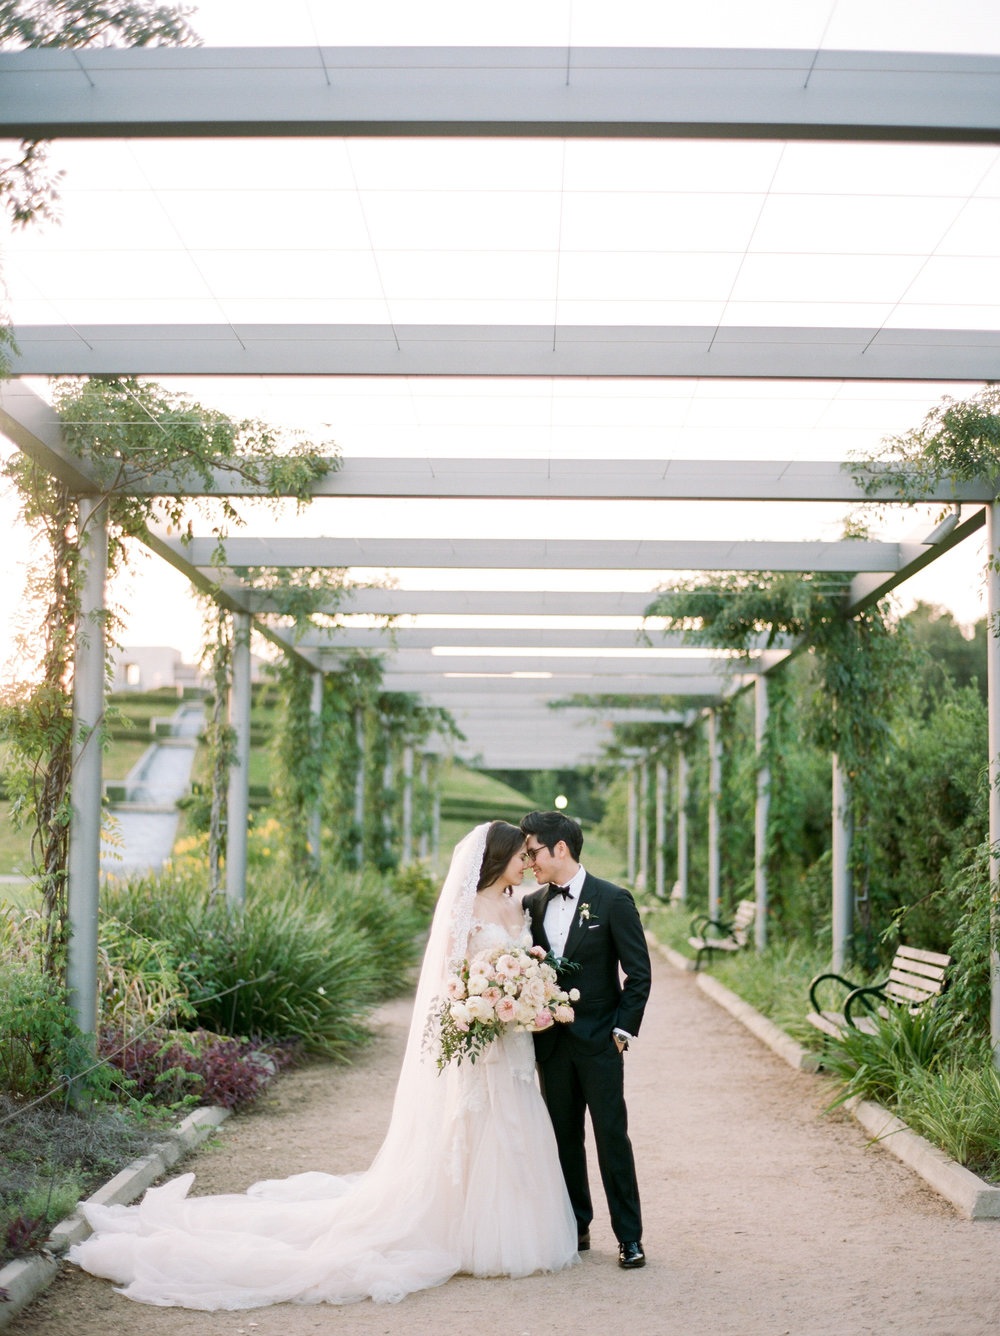 Martha-Stewart-Wedding-Dana-Fernandez-Photography-Josh-Texas-Film-Houston-Wedding-Fine-Art-Photographer-McGovern-Centennial-Gardens-Top-Best-37.jpg